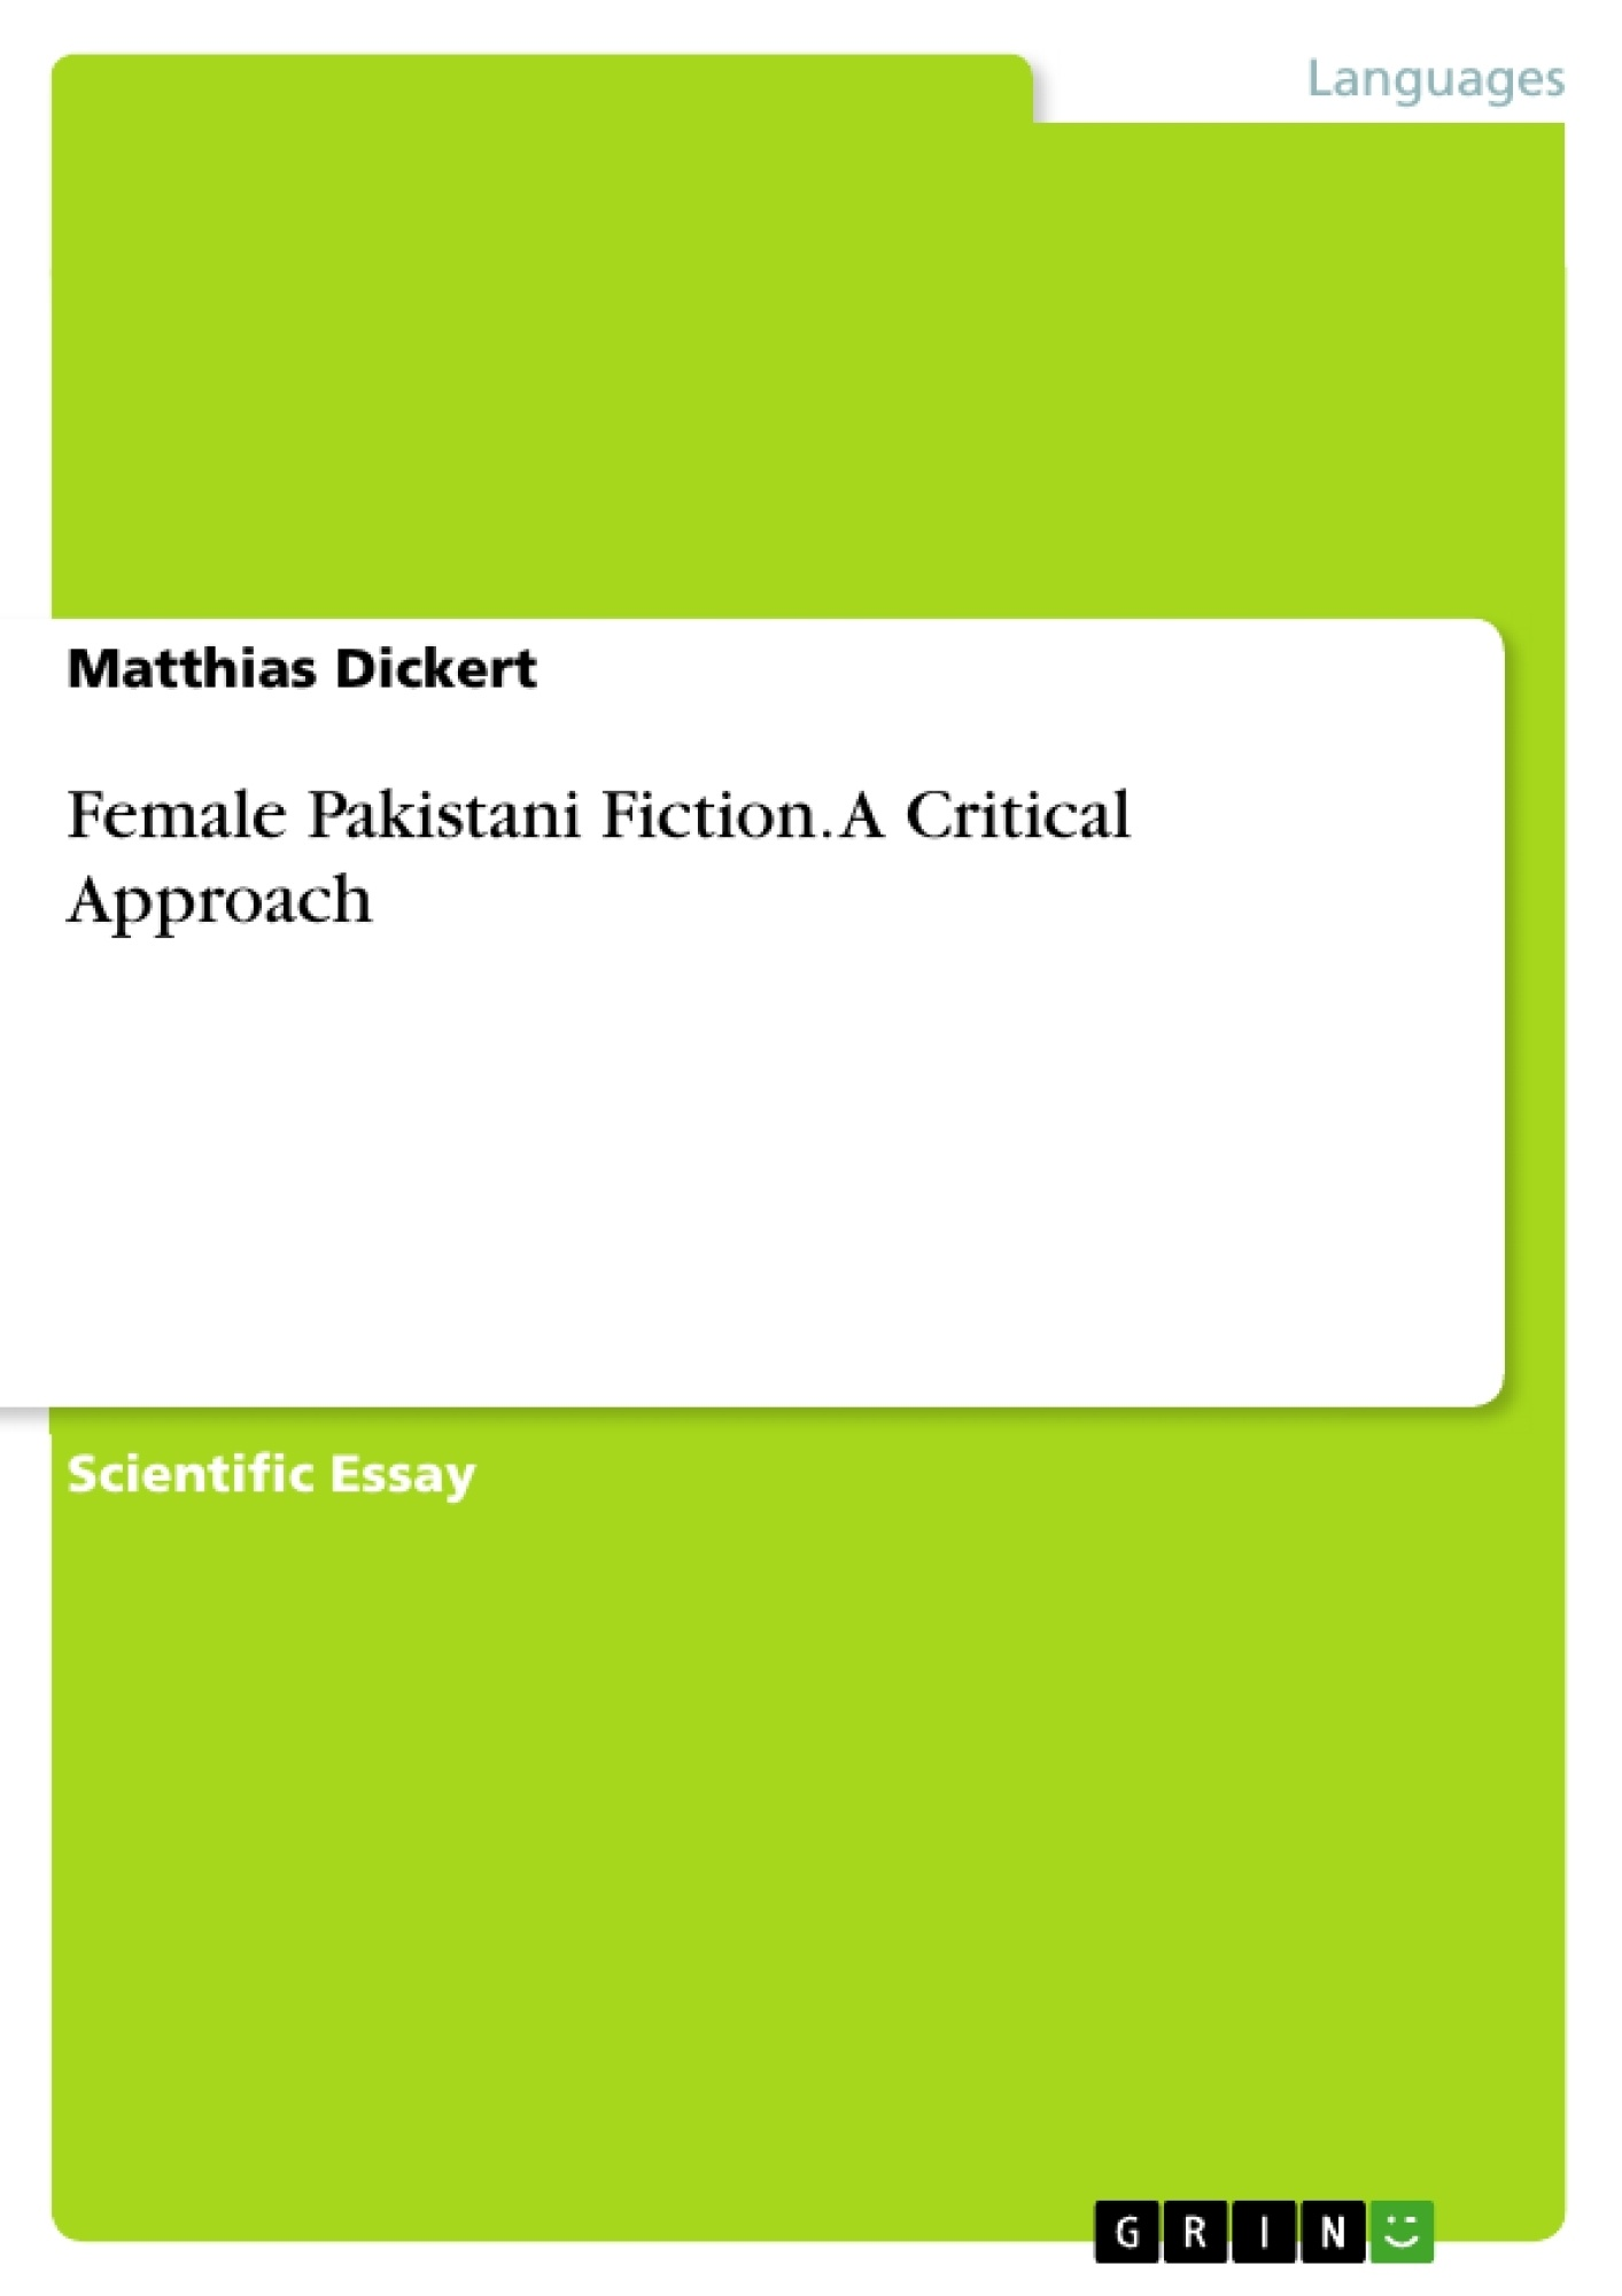 Title: Female Pakistani Fiction. A Critical Approach